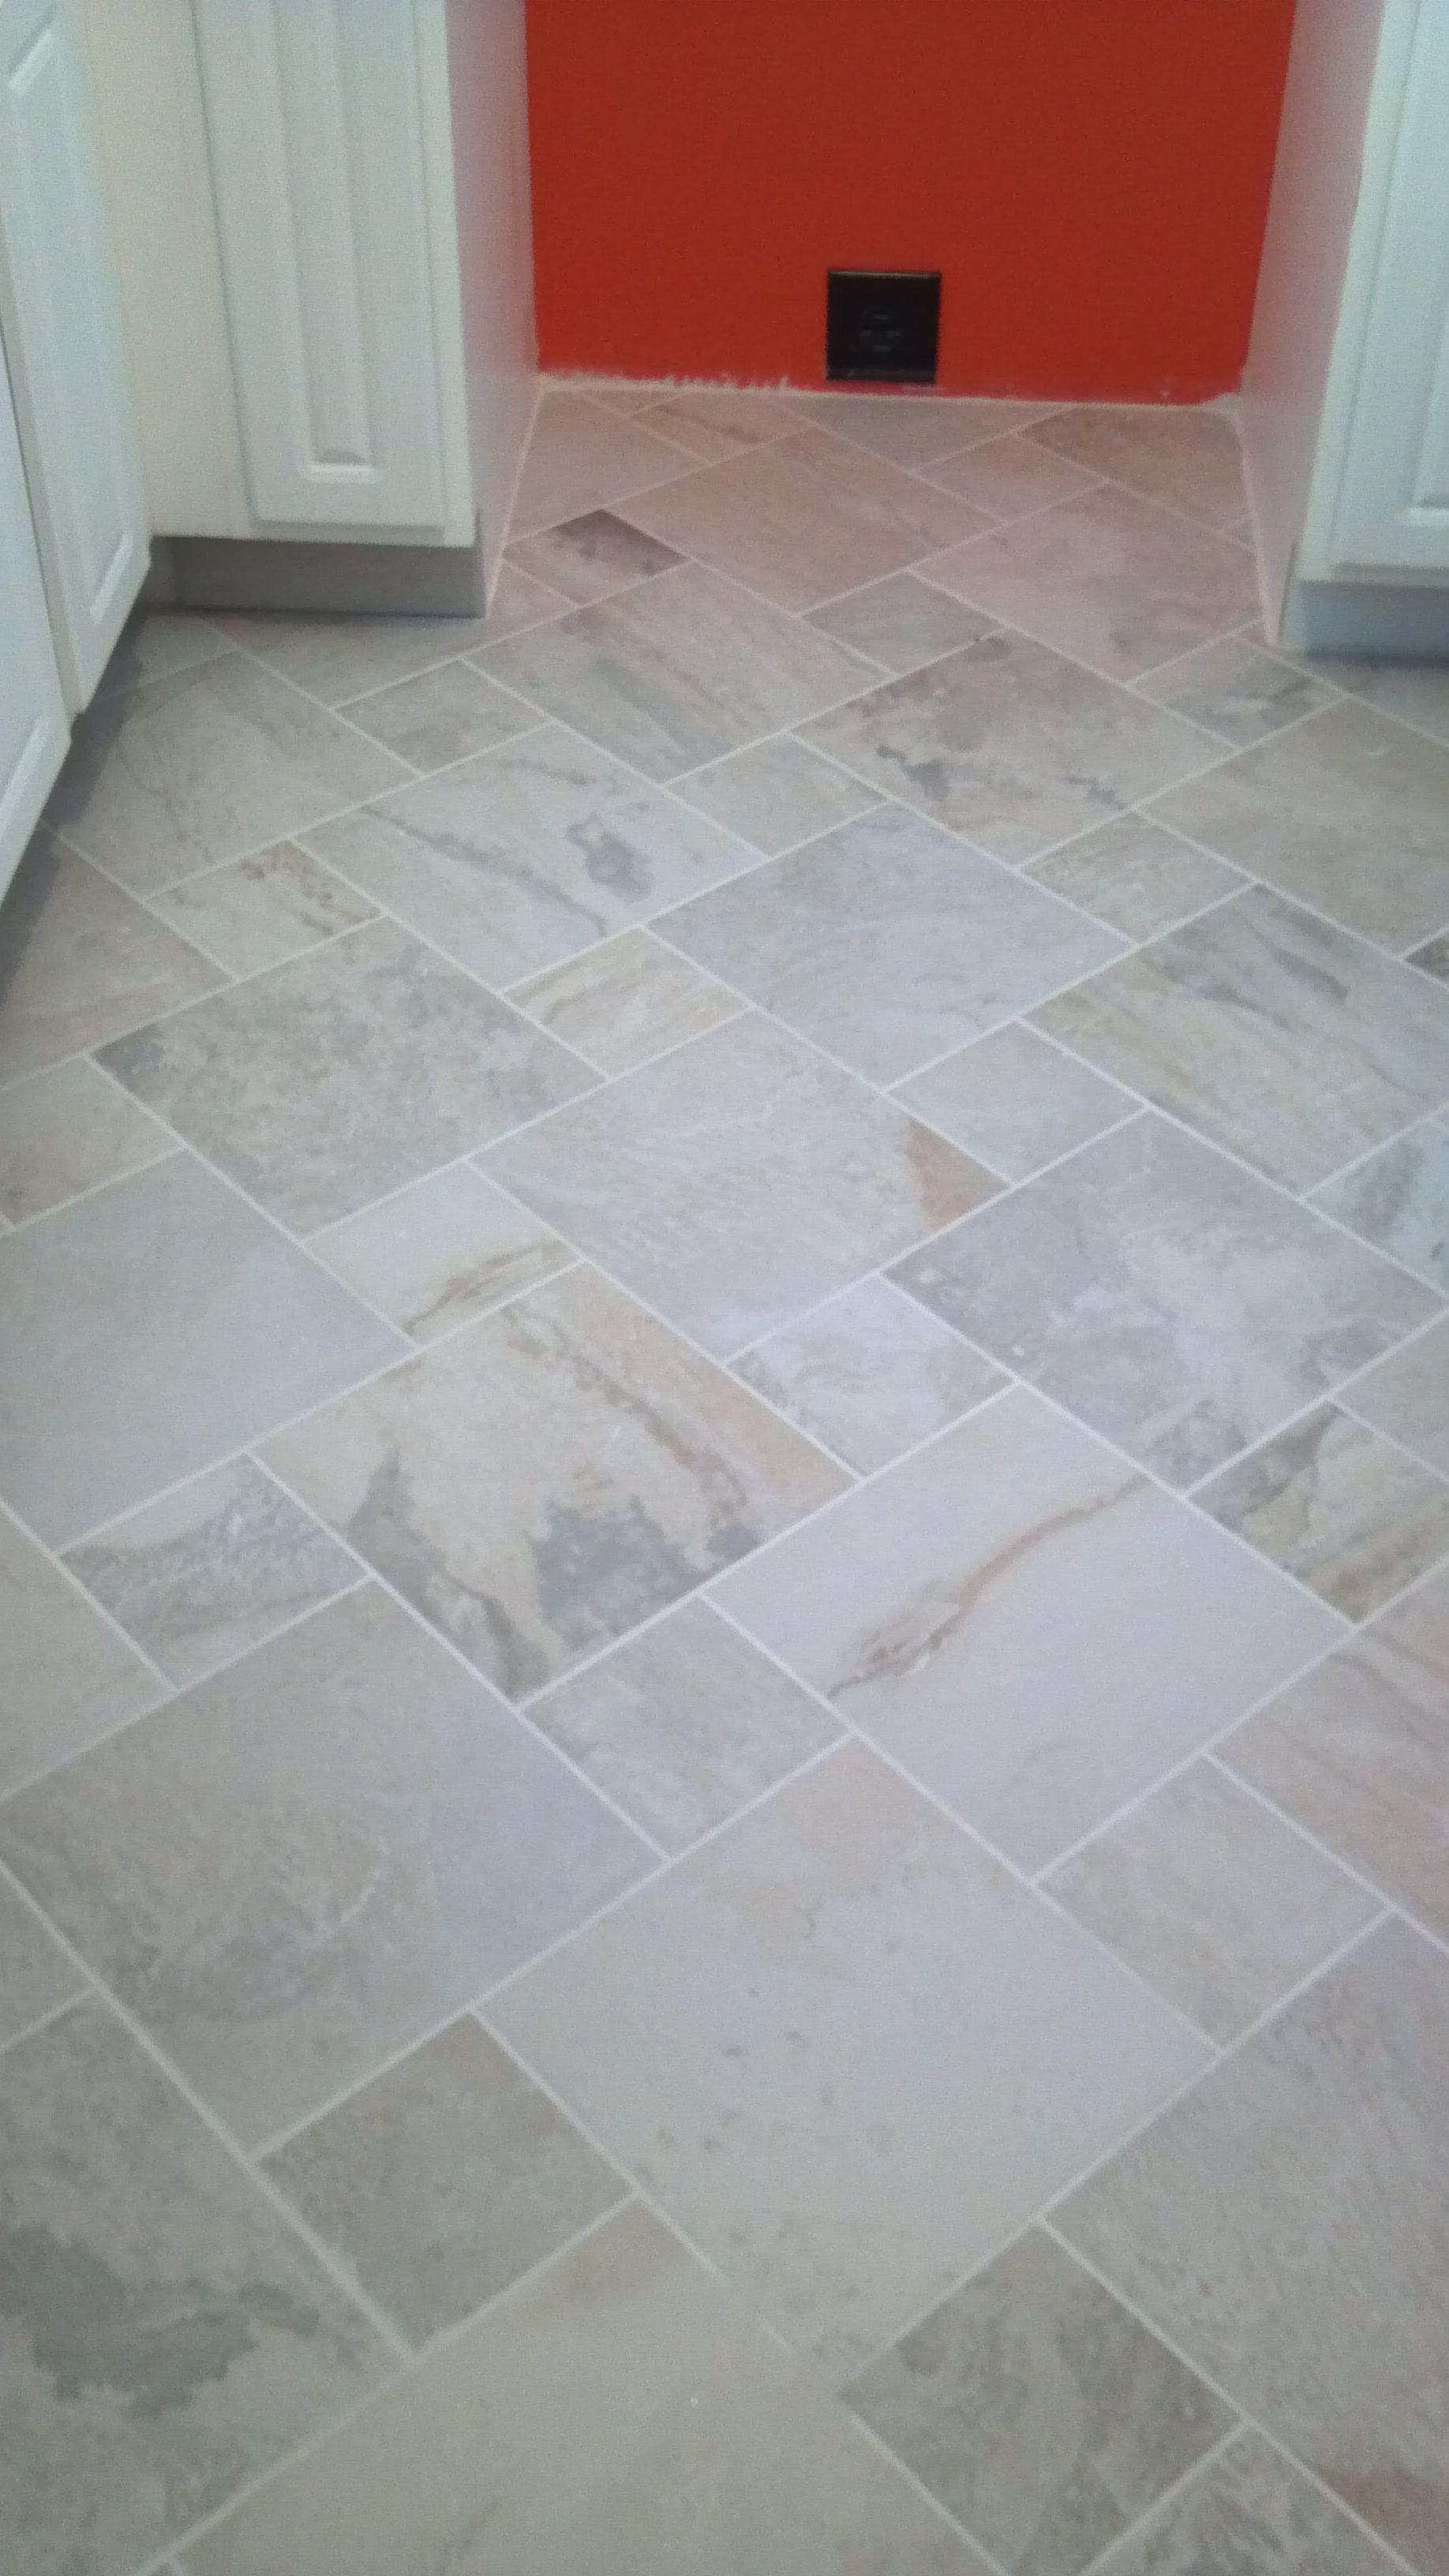 lowes kitchen flooring Ivetta White porcelain tile Lowes